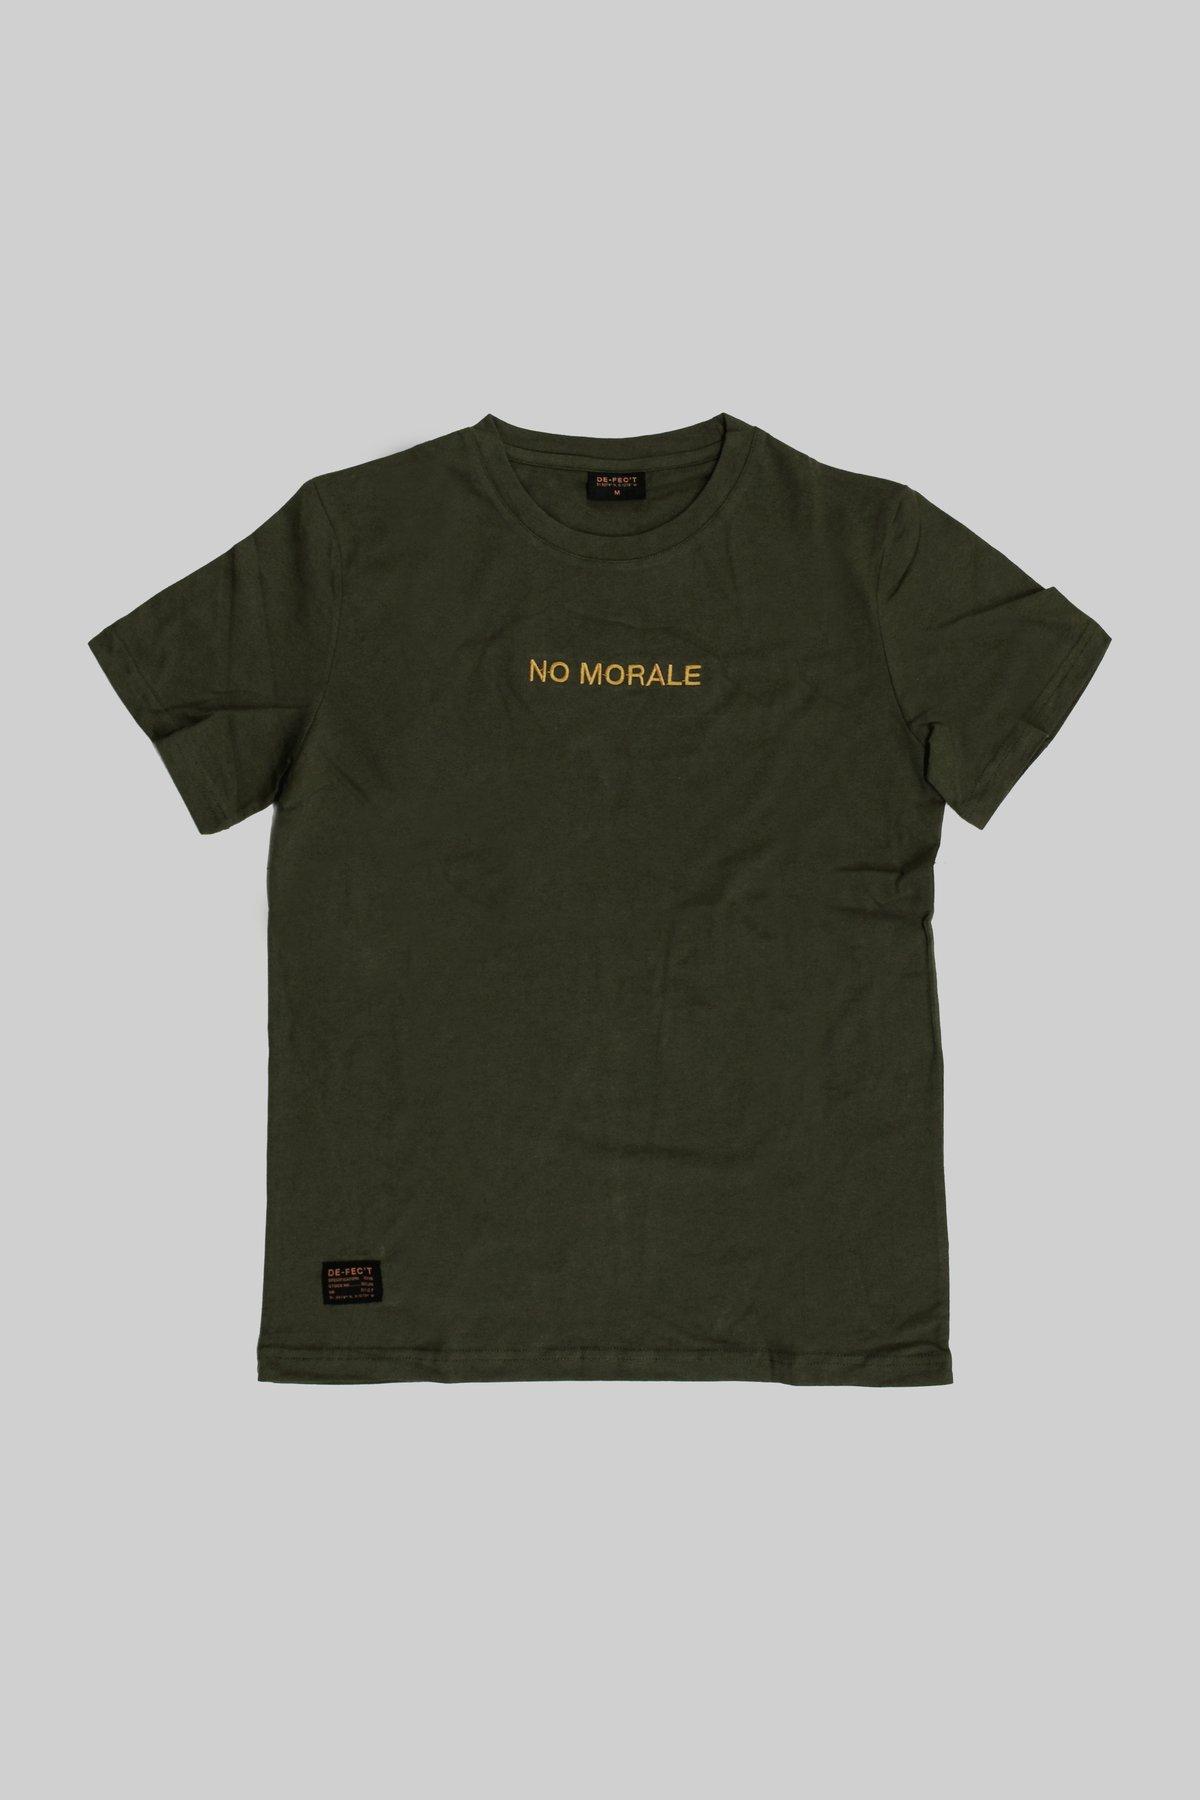 Image of No Morale - Crewneck T-shirt